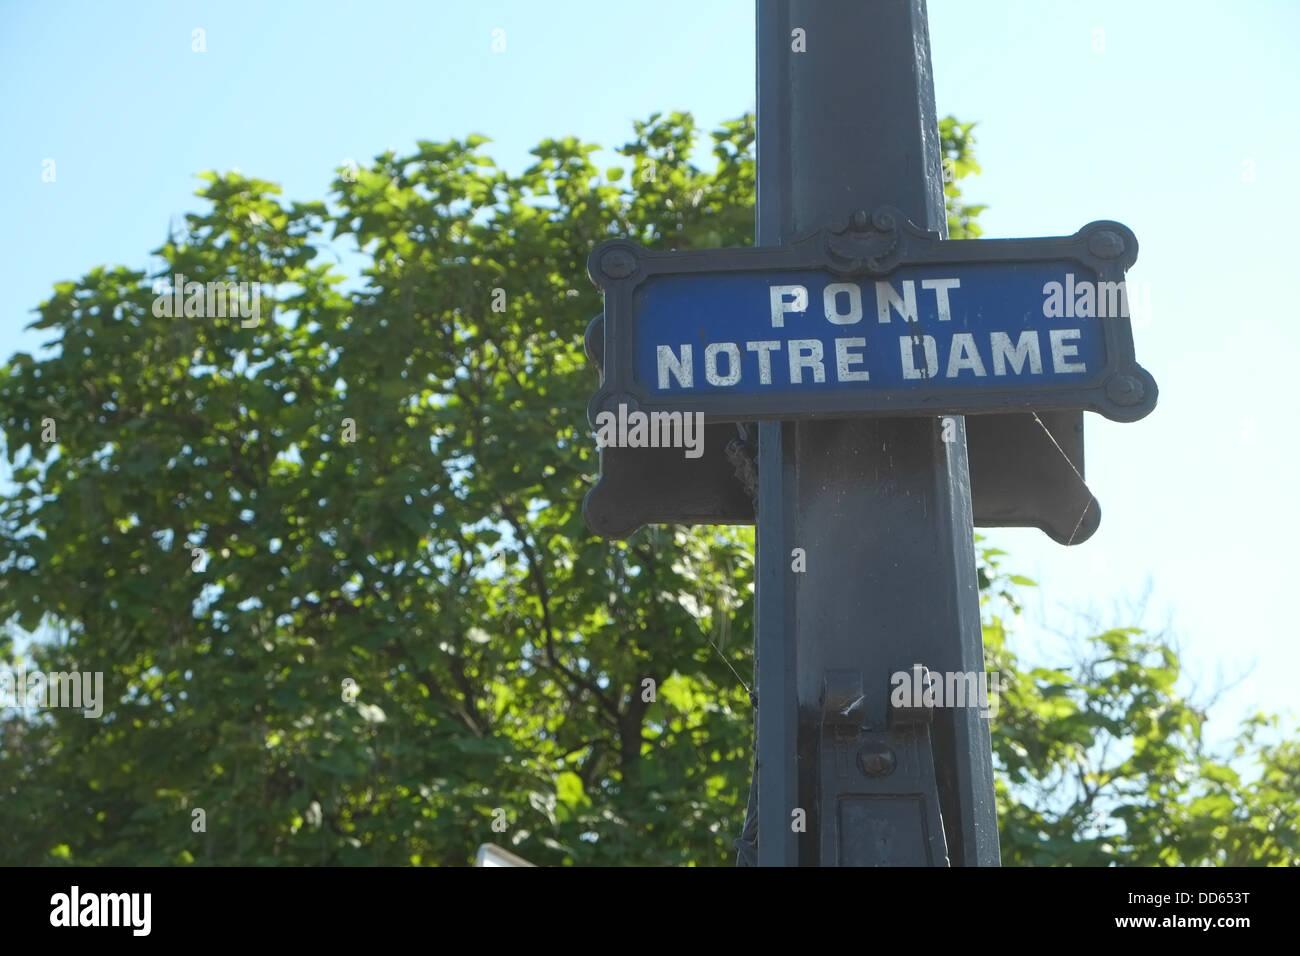 Pont Notre Dame (Notre Dame Bridge sign). - Stock Image